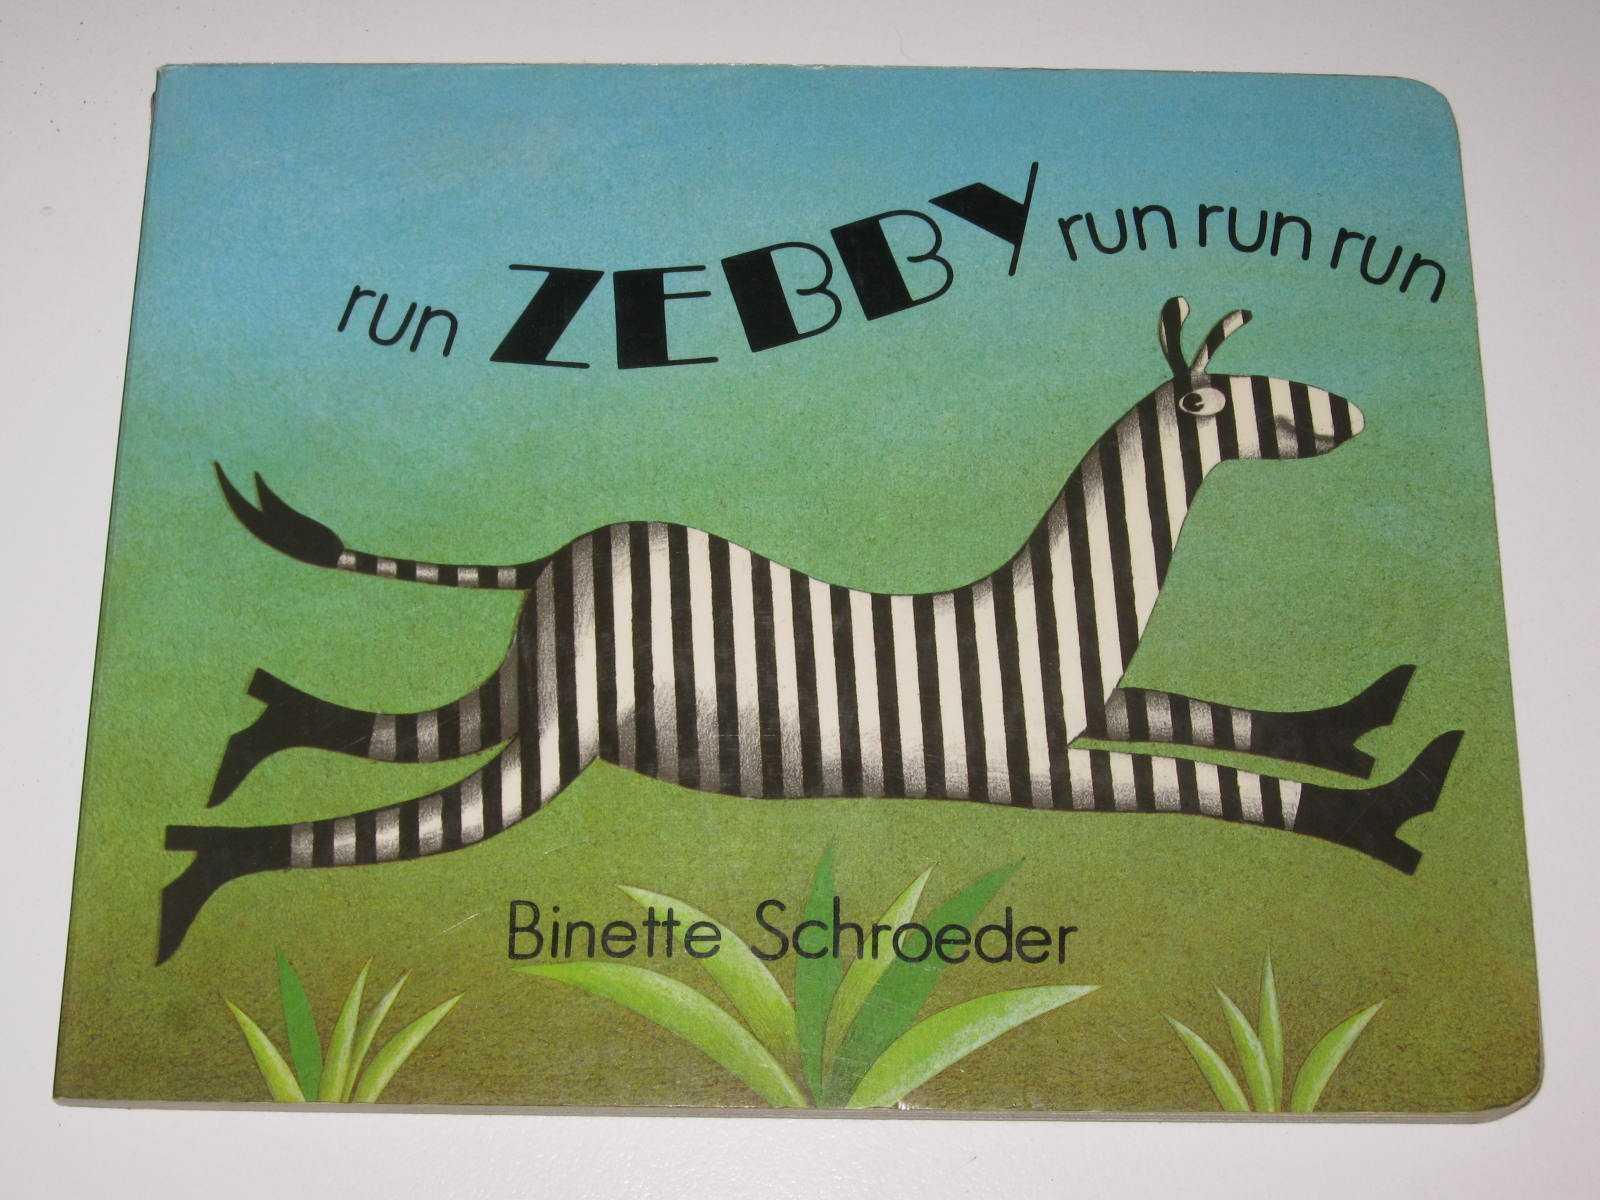 Run Zebby Run Run Run, Schroeder, Binette